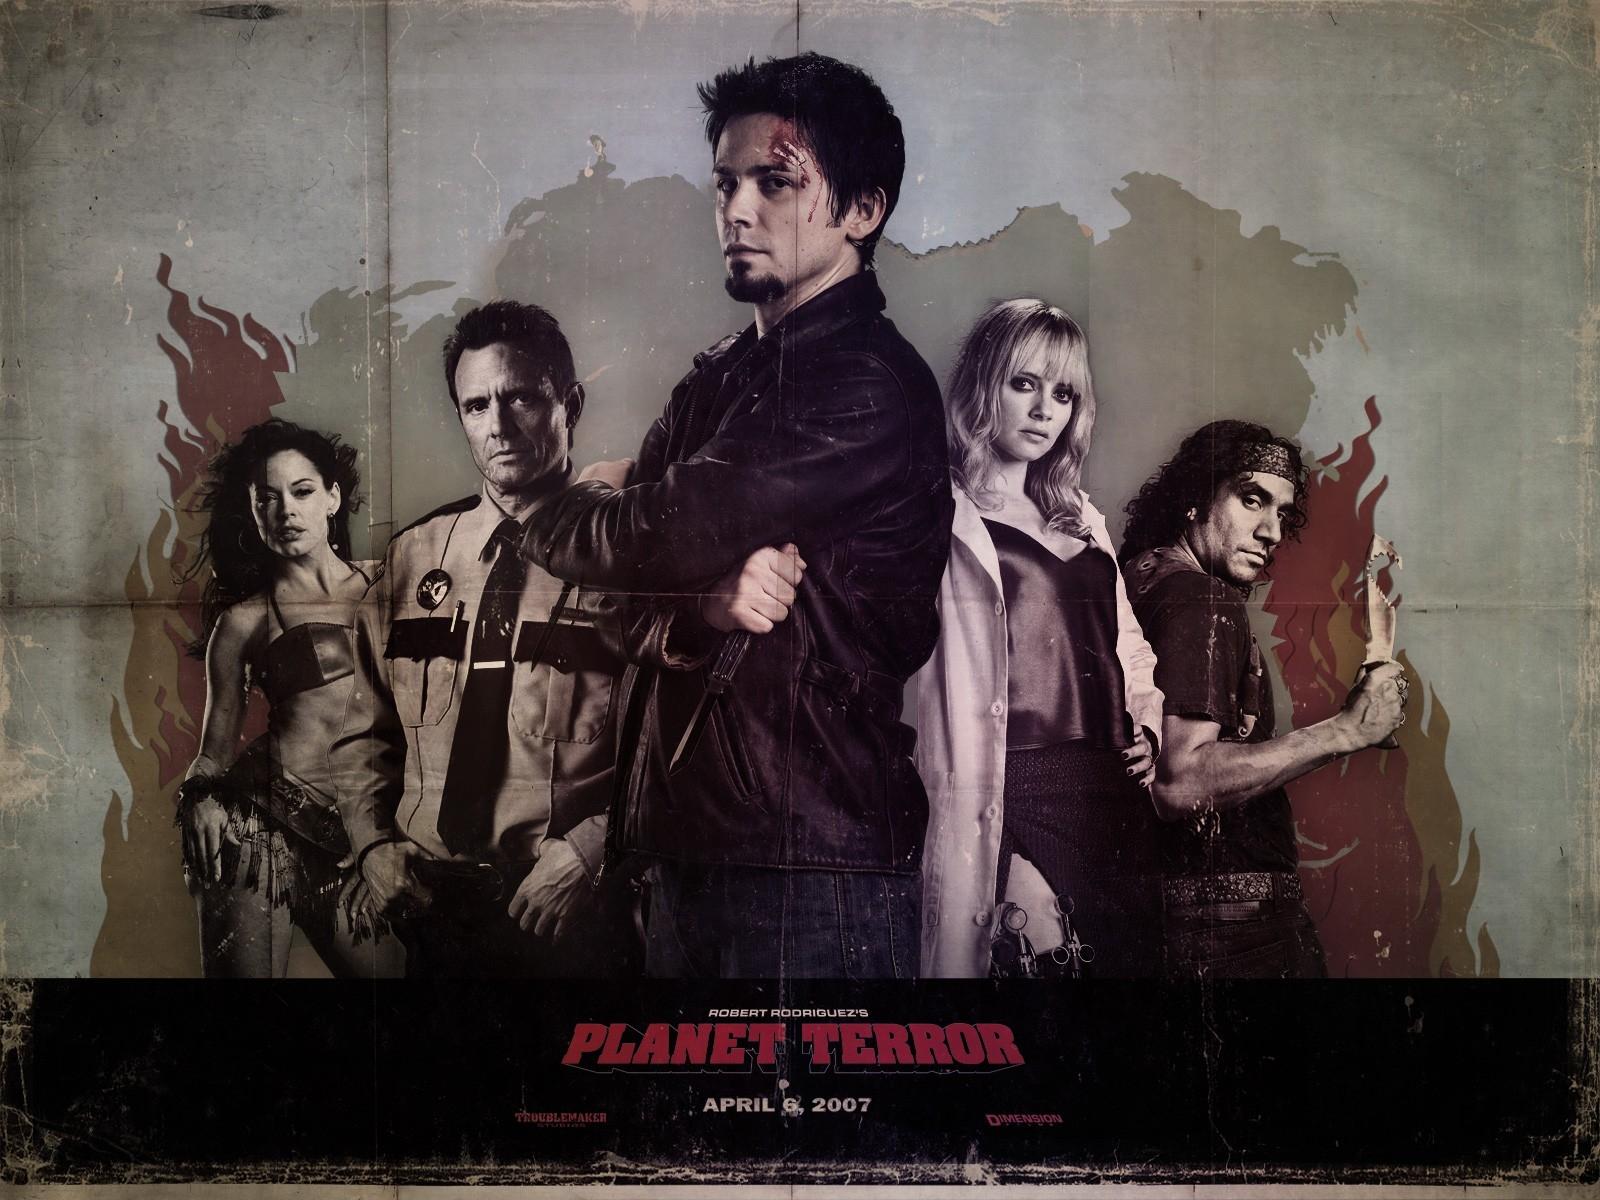 Wallpaper del film Grindhouse con Freddy Rodriguez al centro